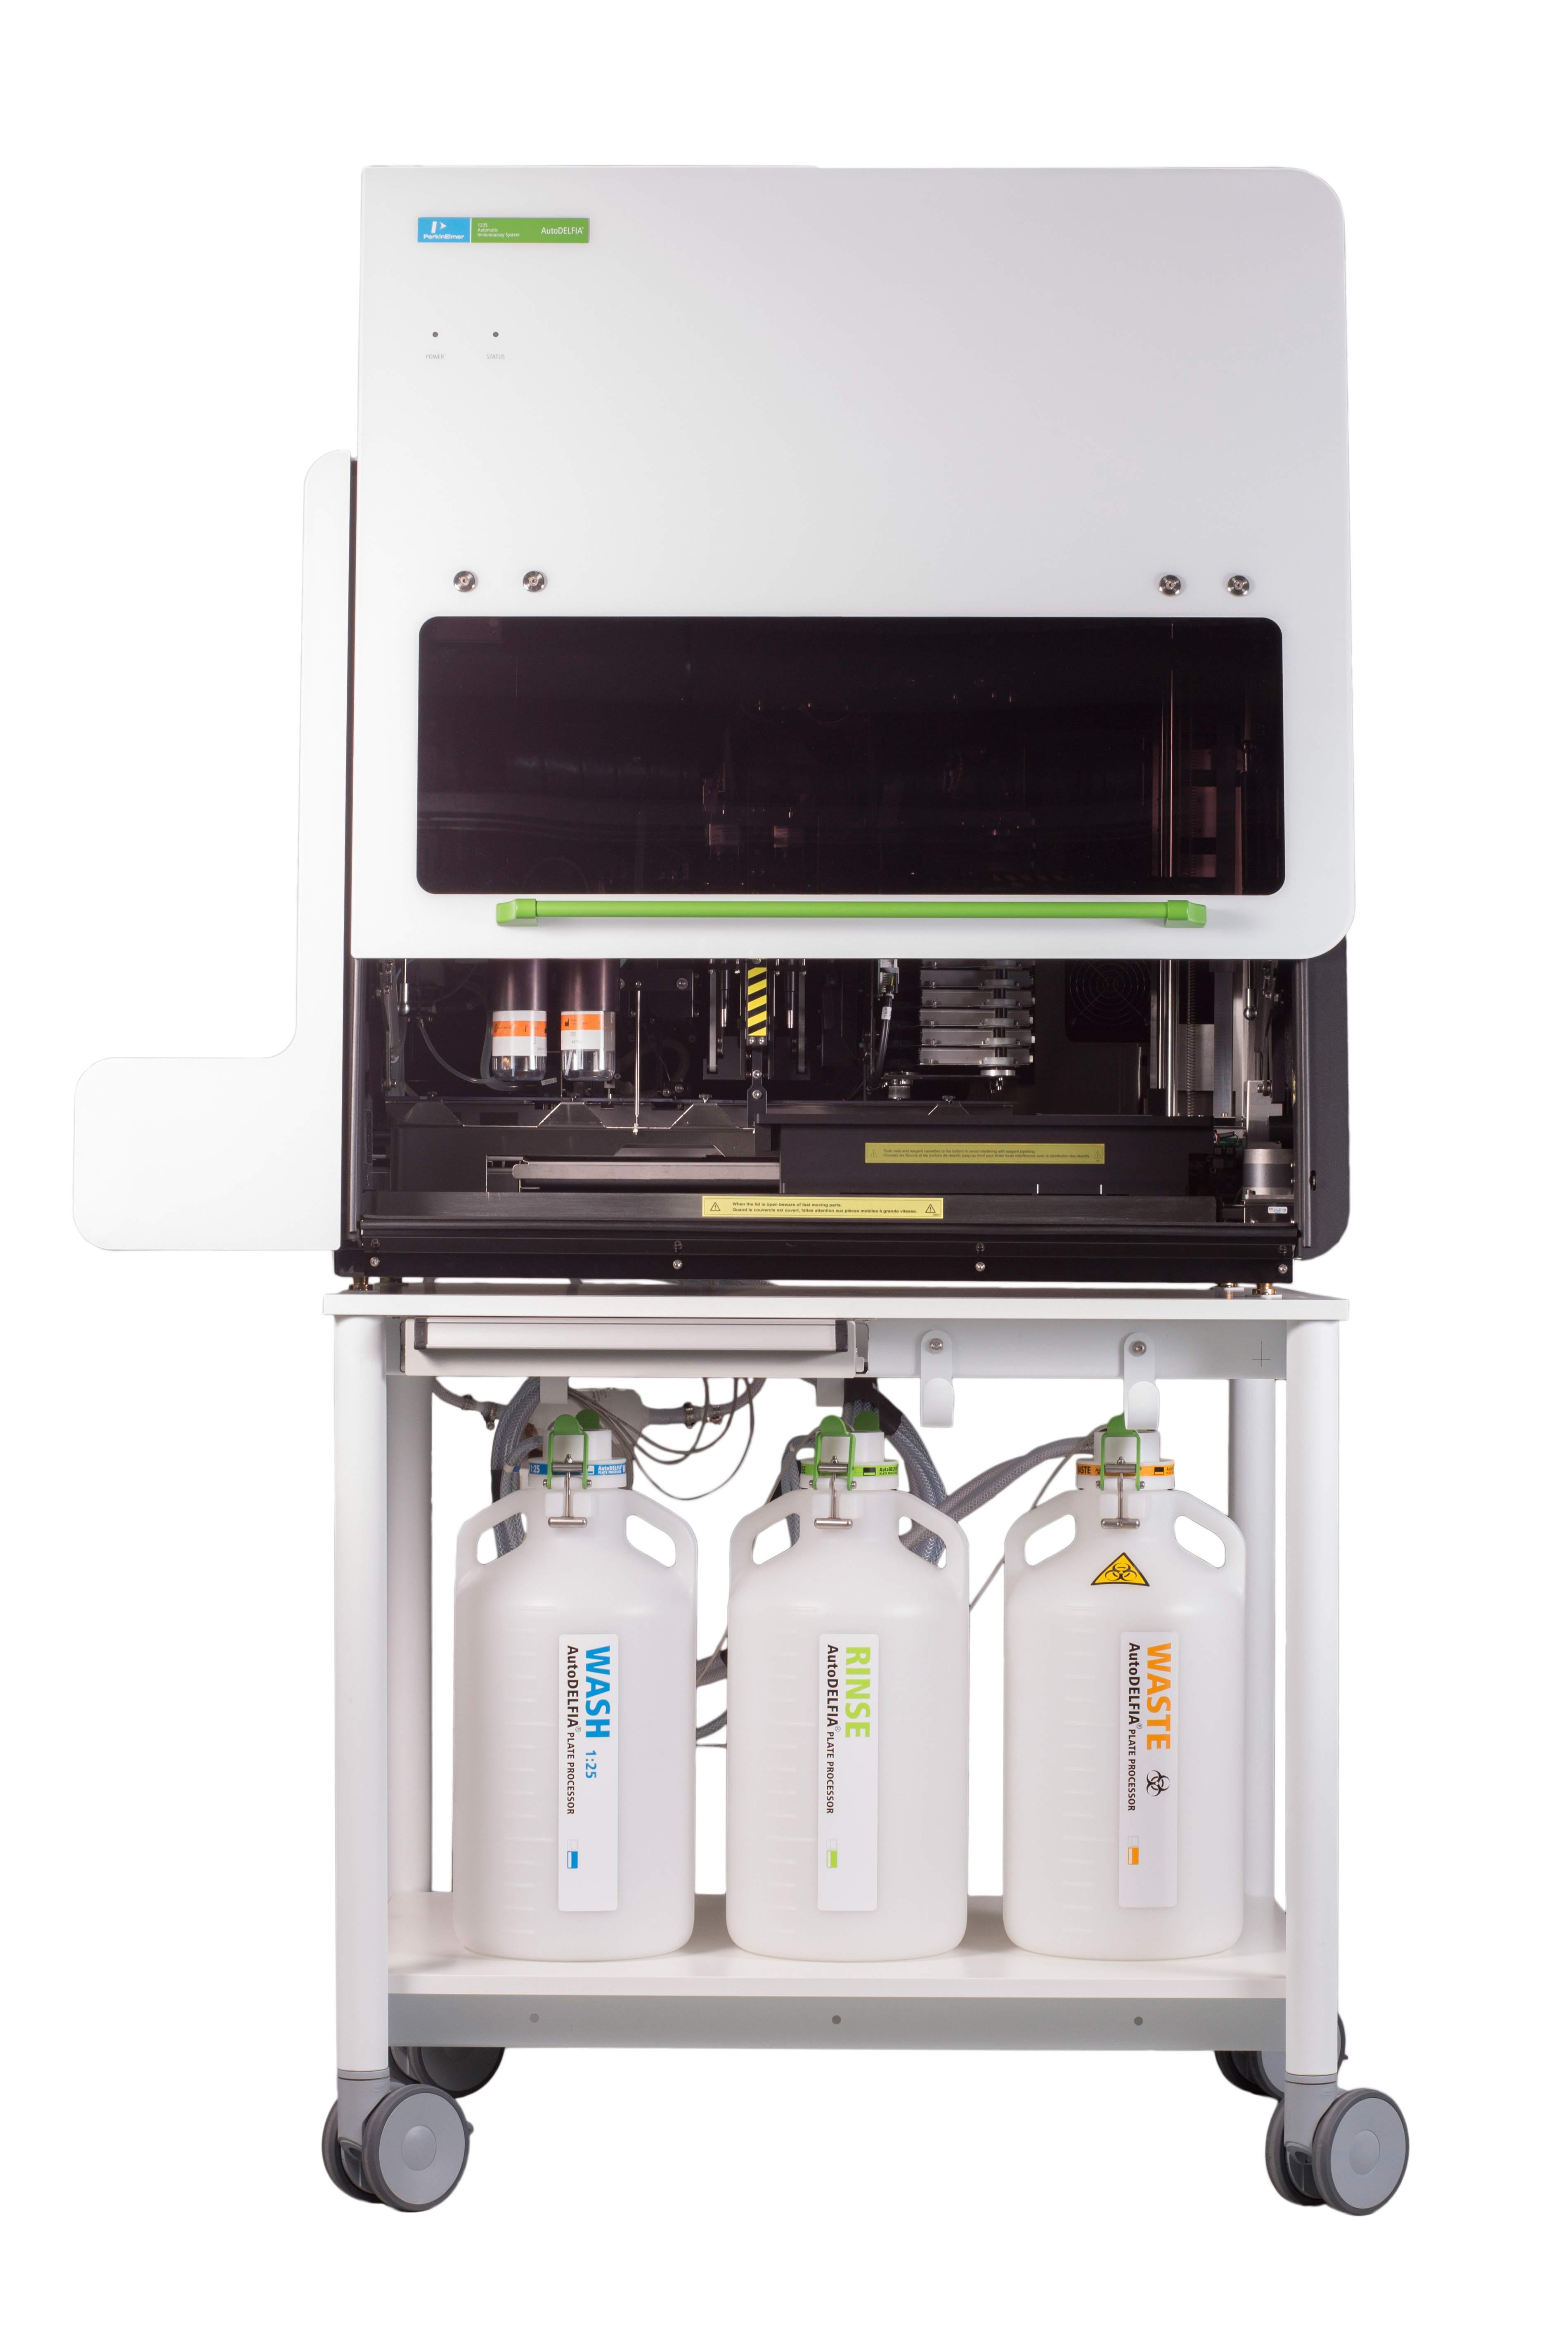 Autodelfia 174 Instrument Automatic Immunoassay System